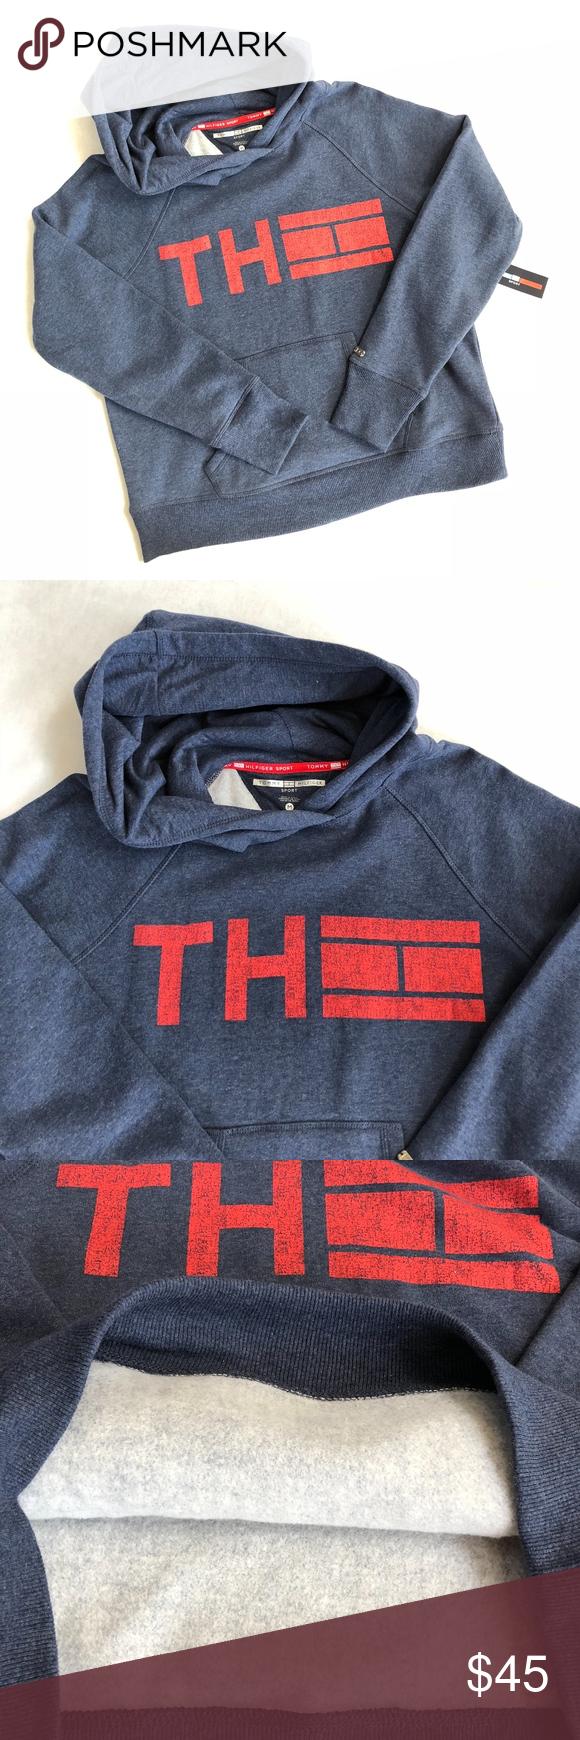 Tommy Hilfiger Th Flag Blue Red Sweatshirt Hoodie Nwt Red Sweatshirt Hoodie Sweatshirts Hoodies Womens